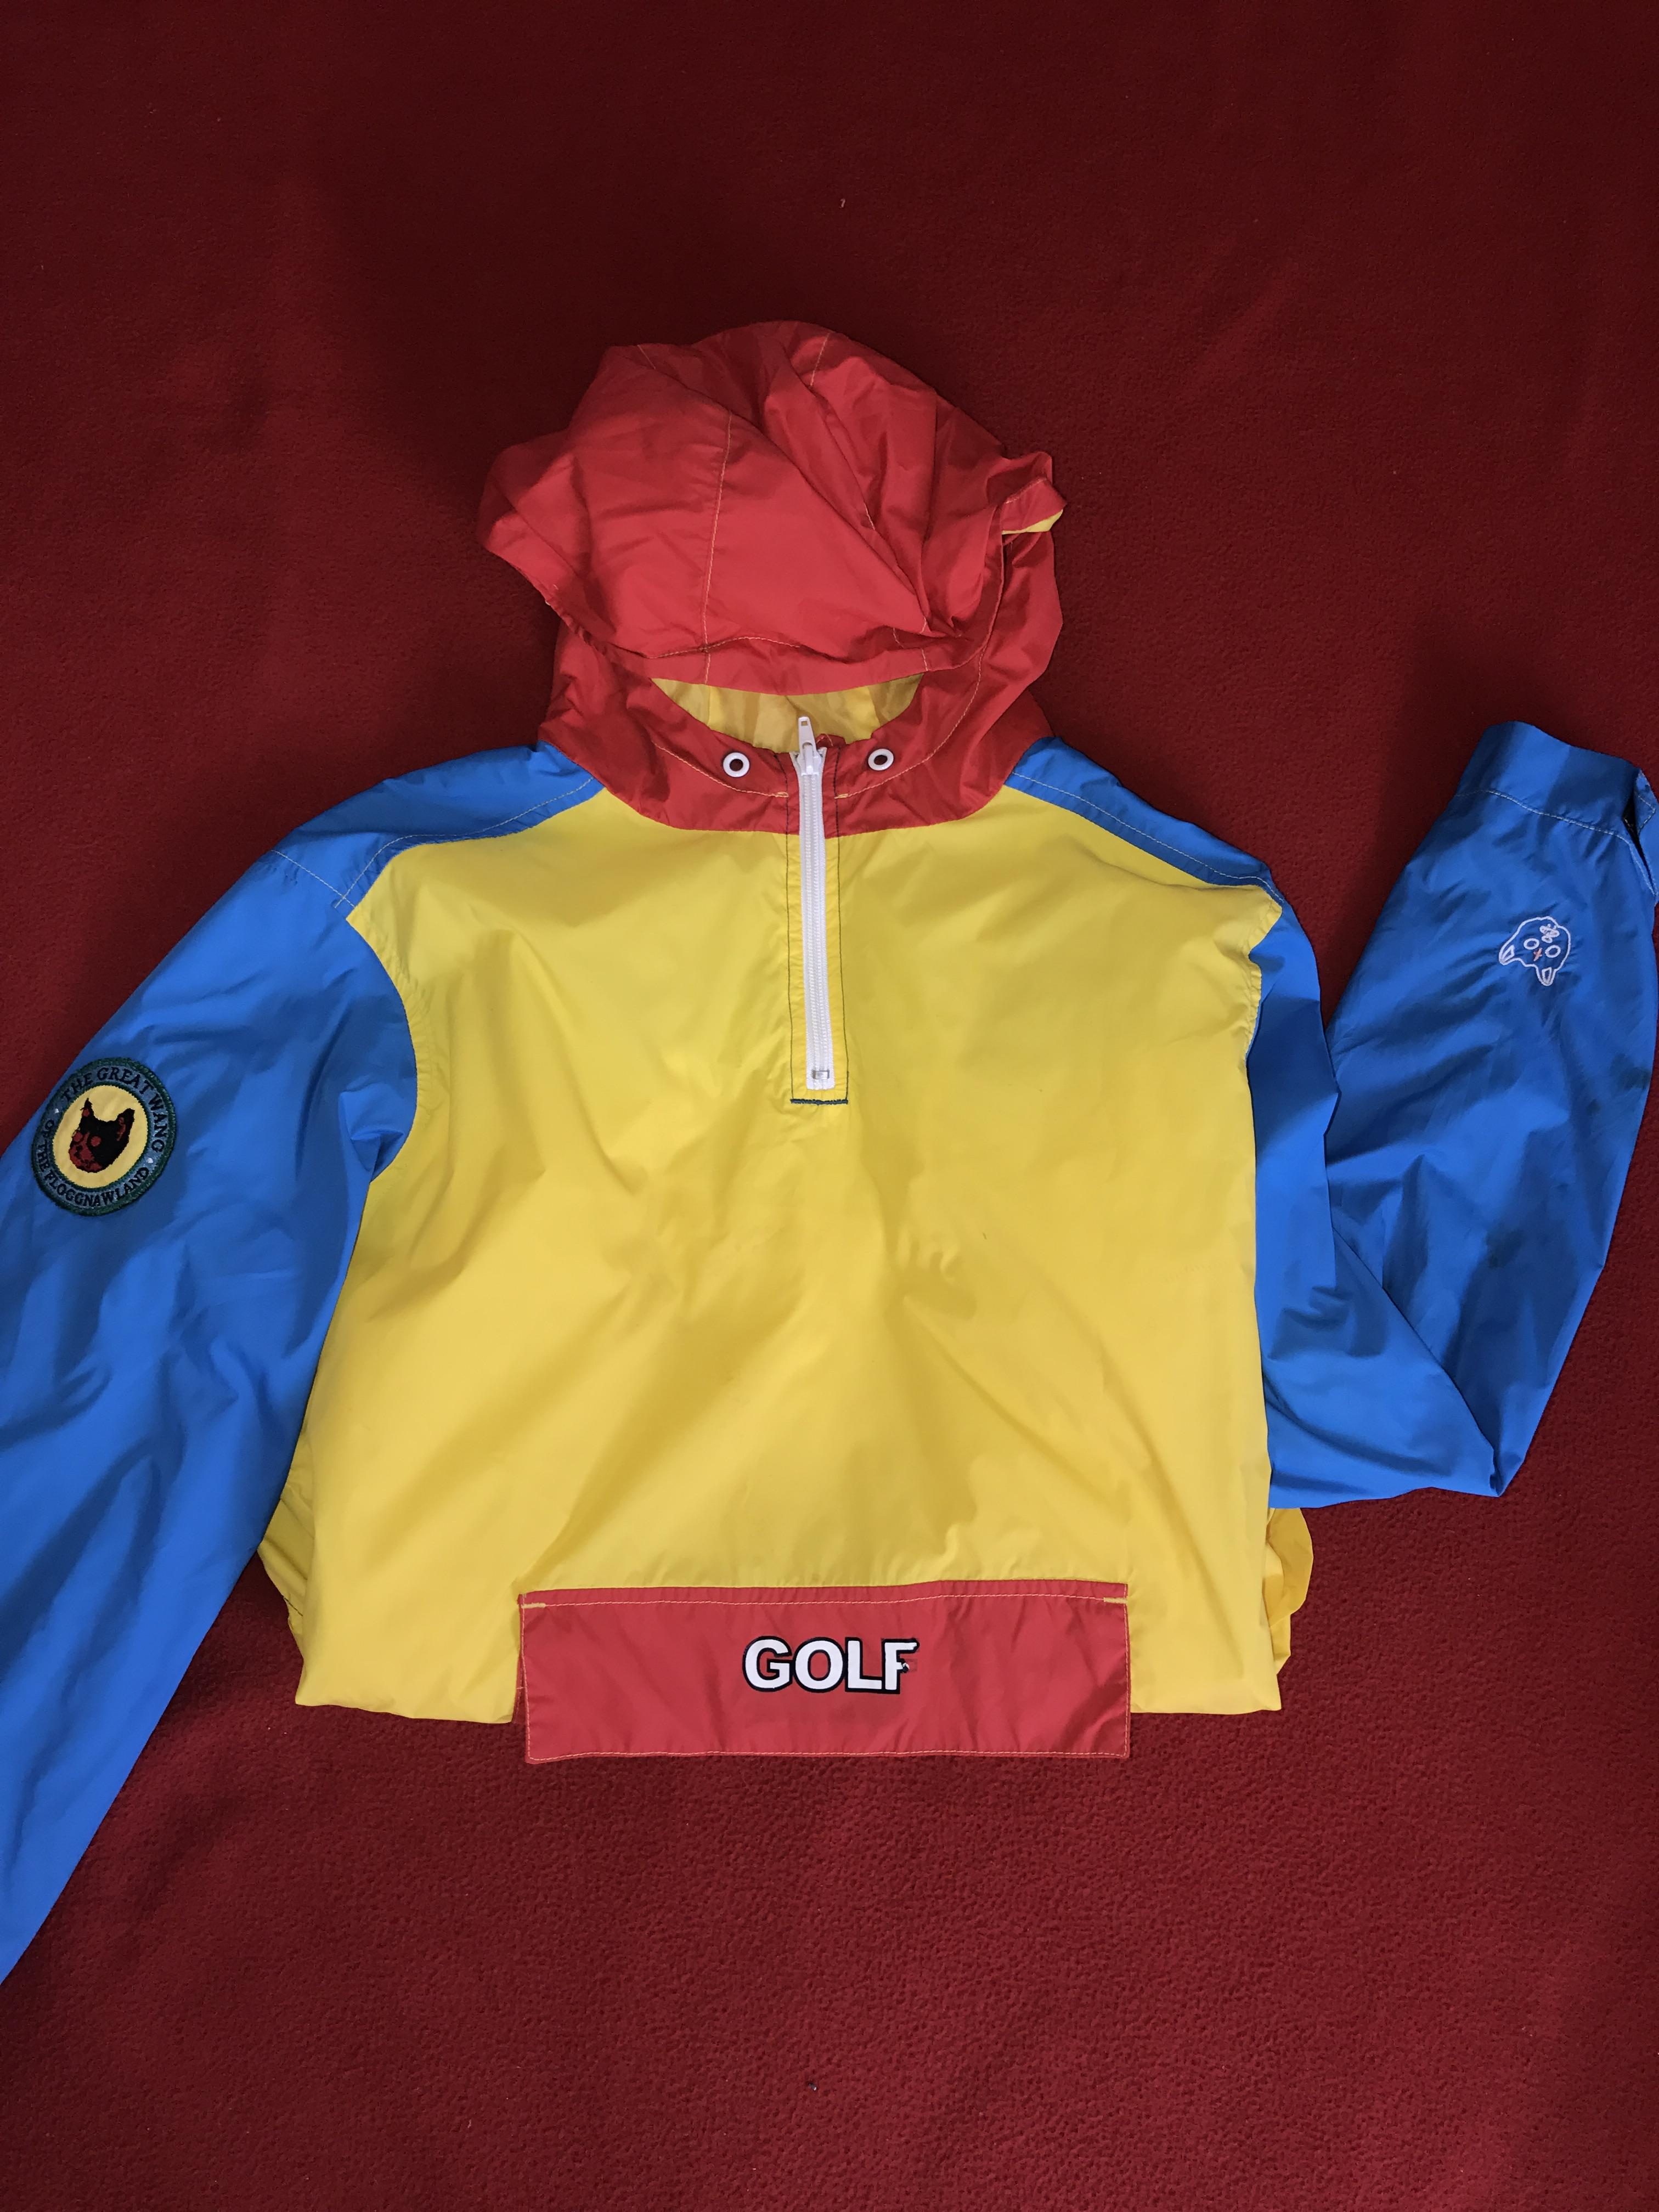 83843e13308b83 Golf Wang Tri Color Windbreaker Size s - Raincoats for Sale - Grailed